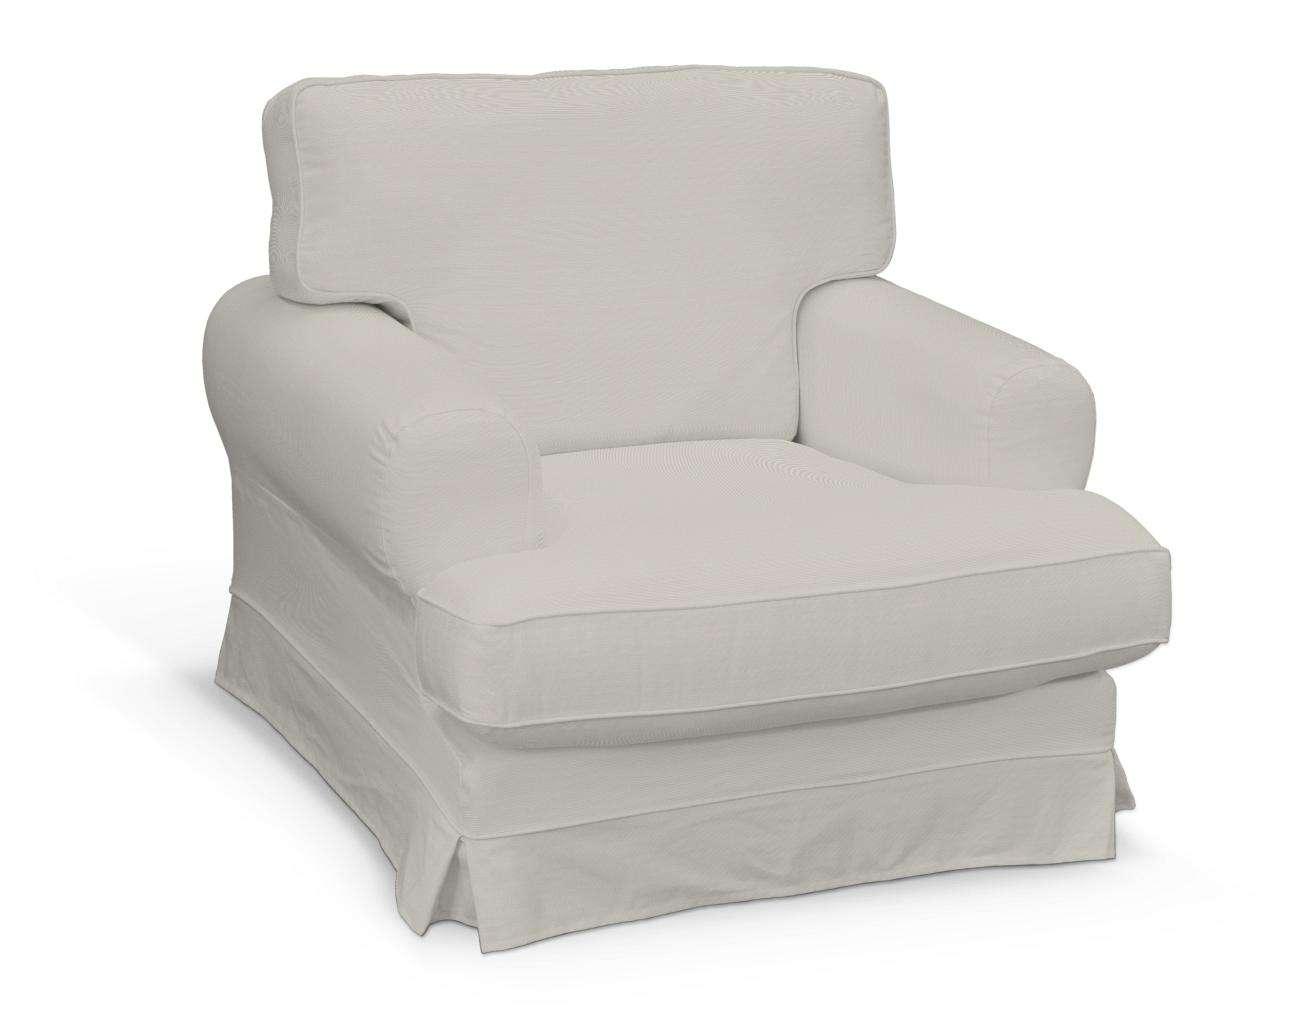 Ekeskog Sesselbezug von der Kollektion Cotton Panama, Stoff: 702-31